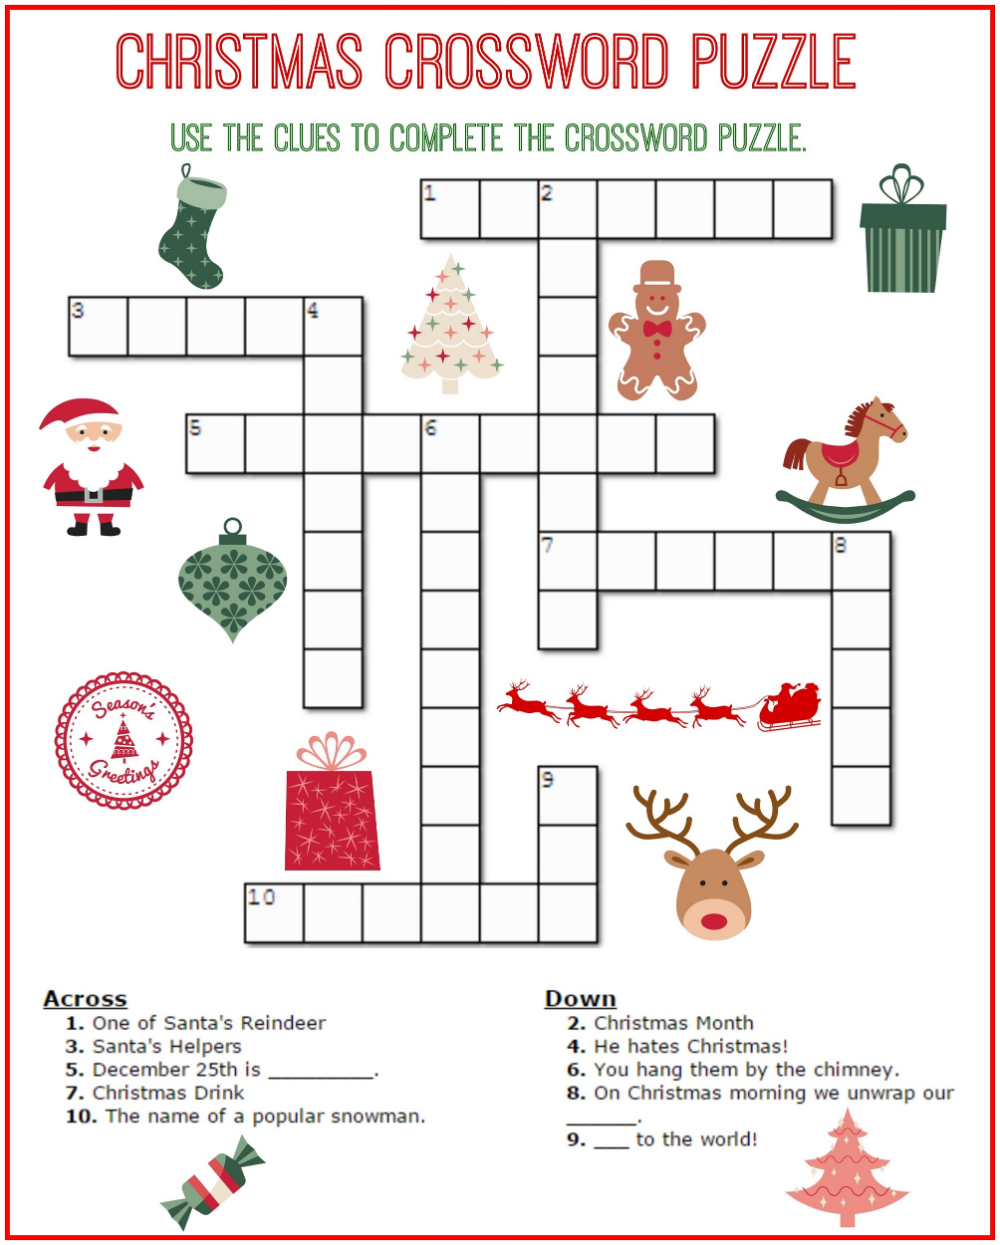 Easy Kids Crossword Puzzles Christmas crossword puzzles